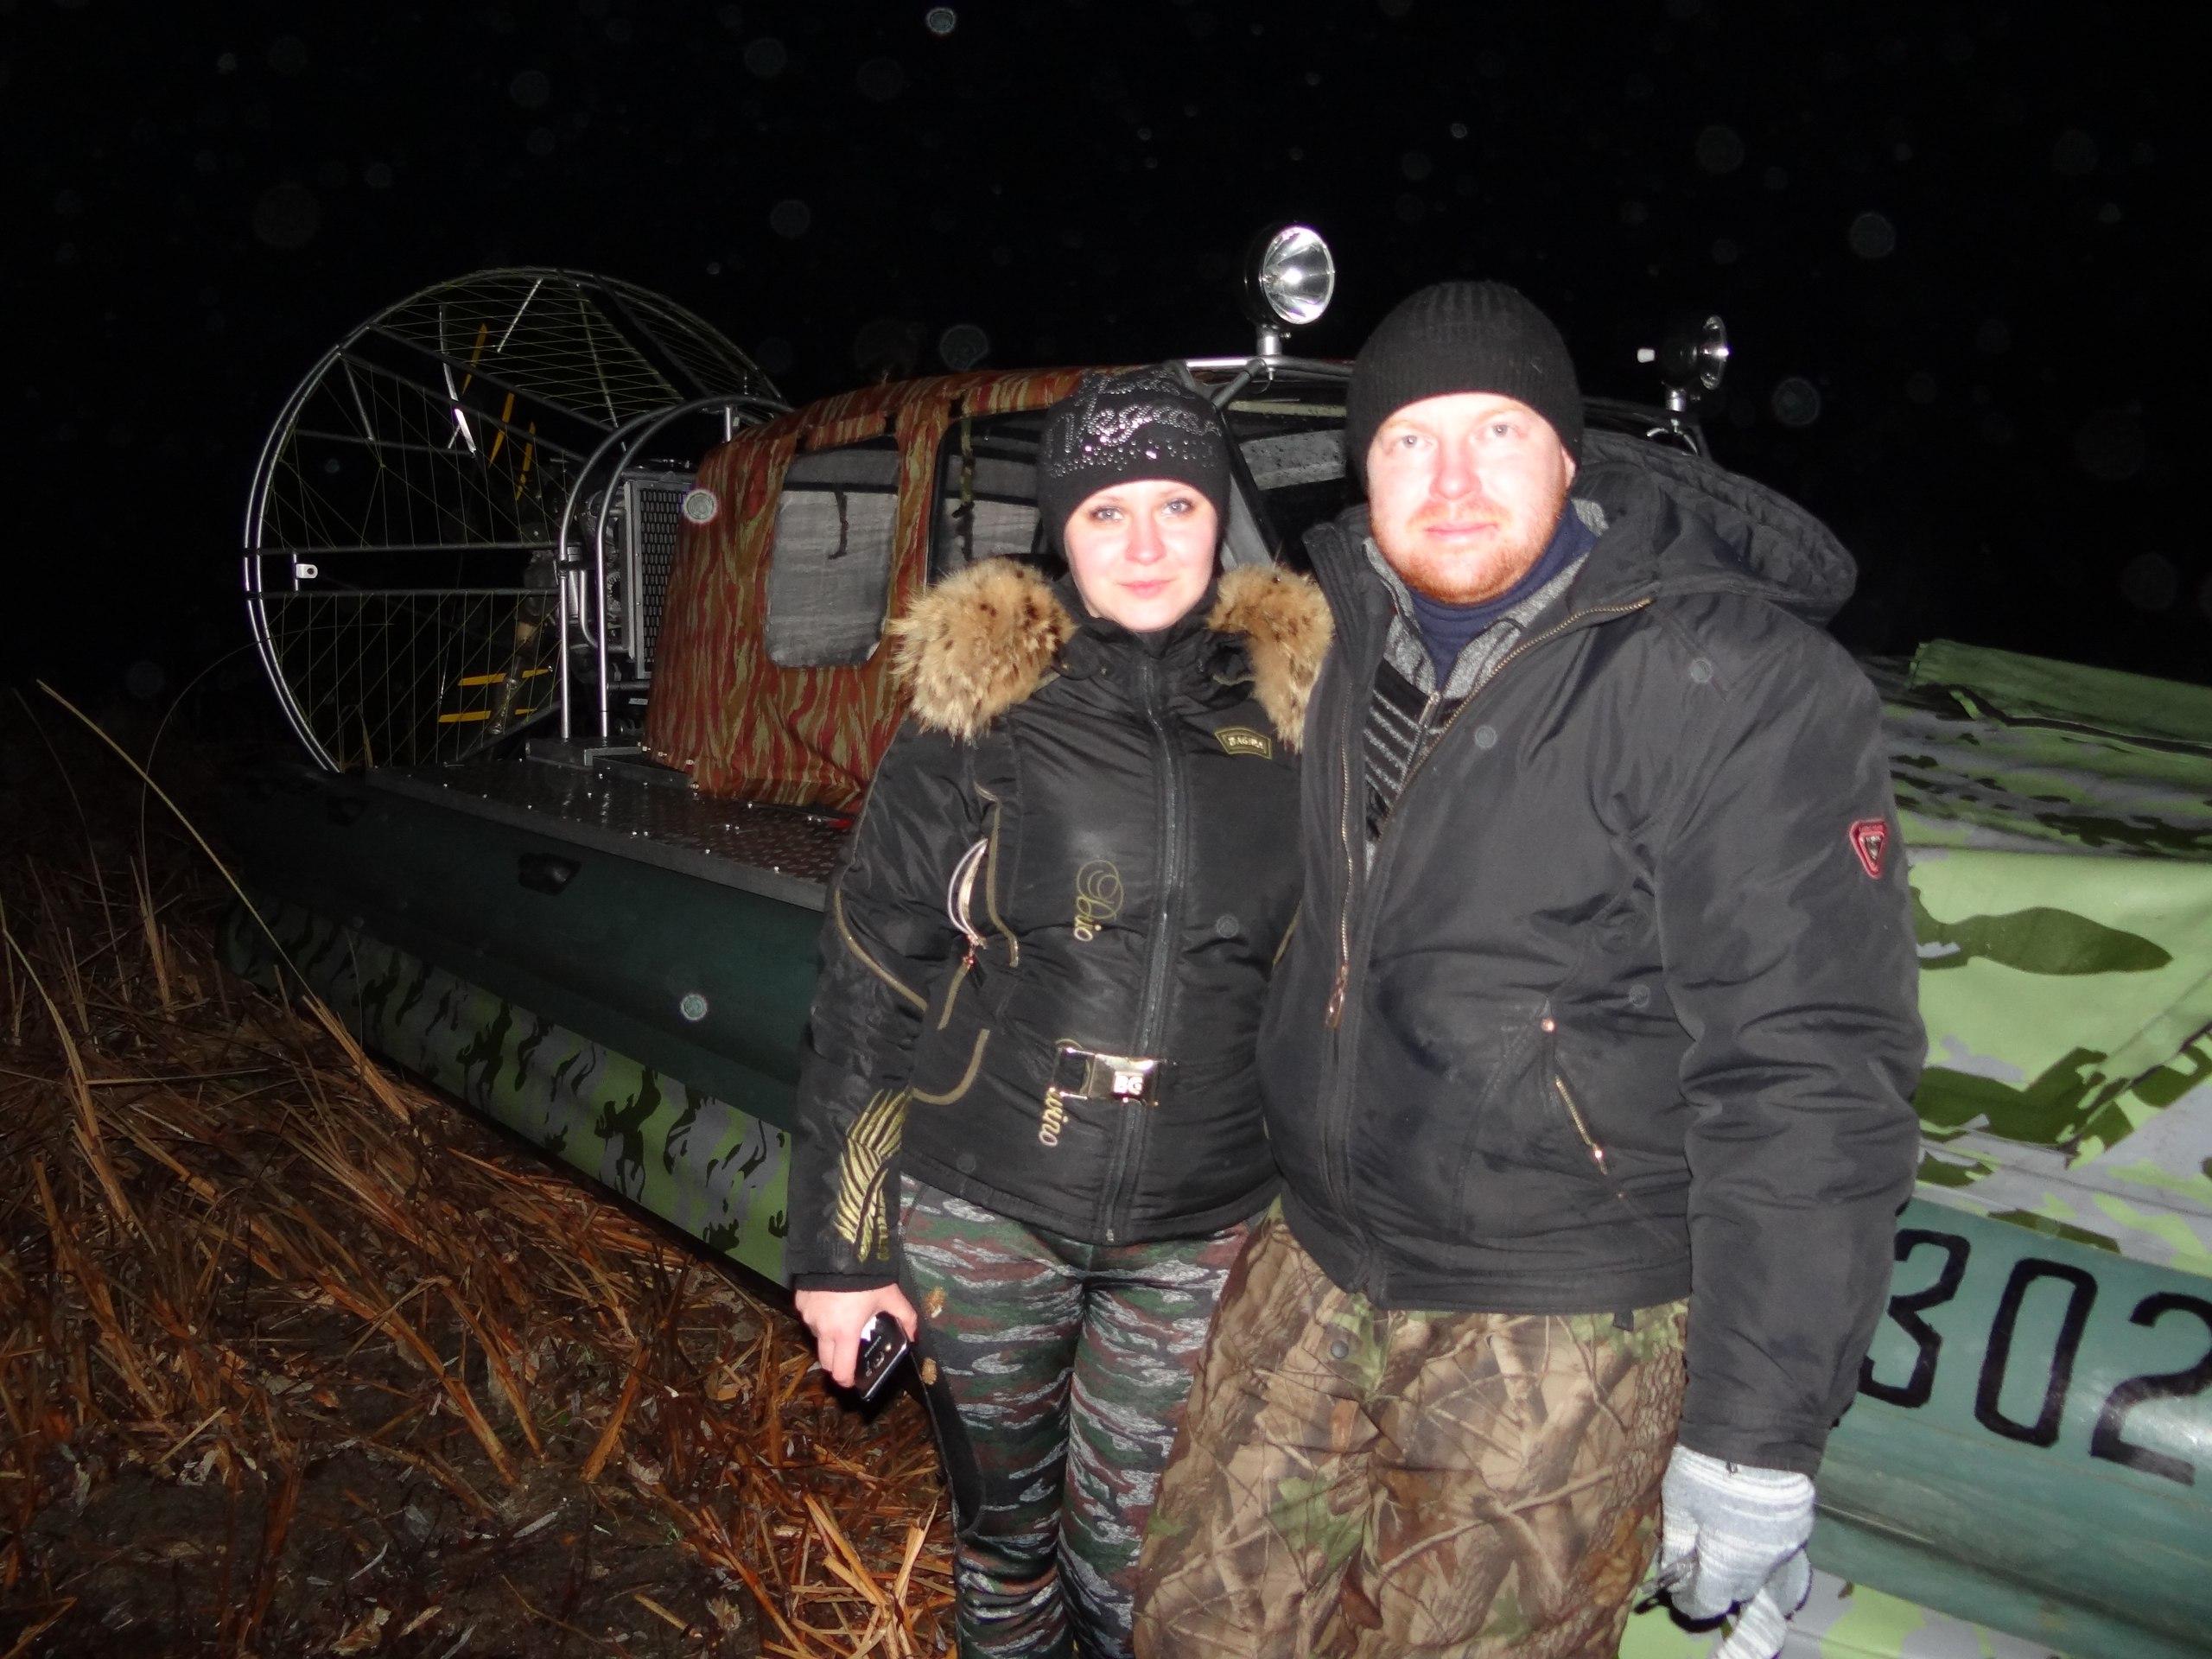 Рождественская зимняя рыбалка   База Застава  